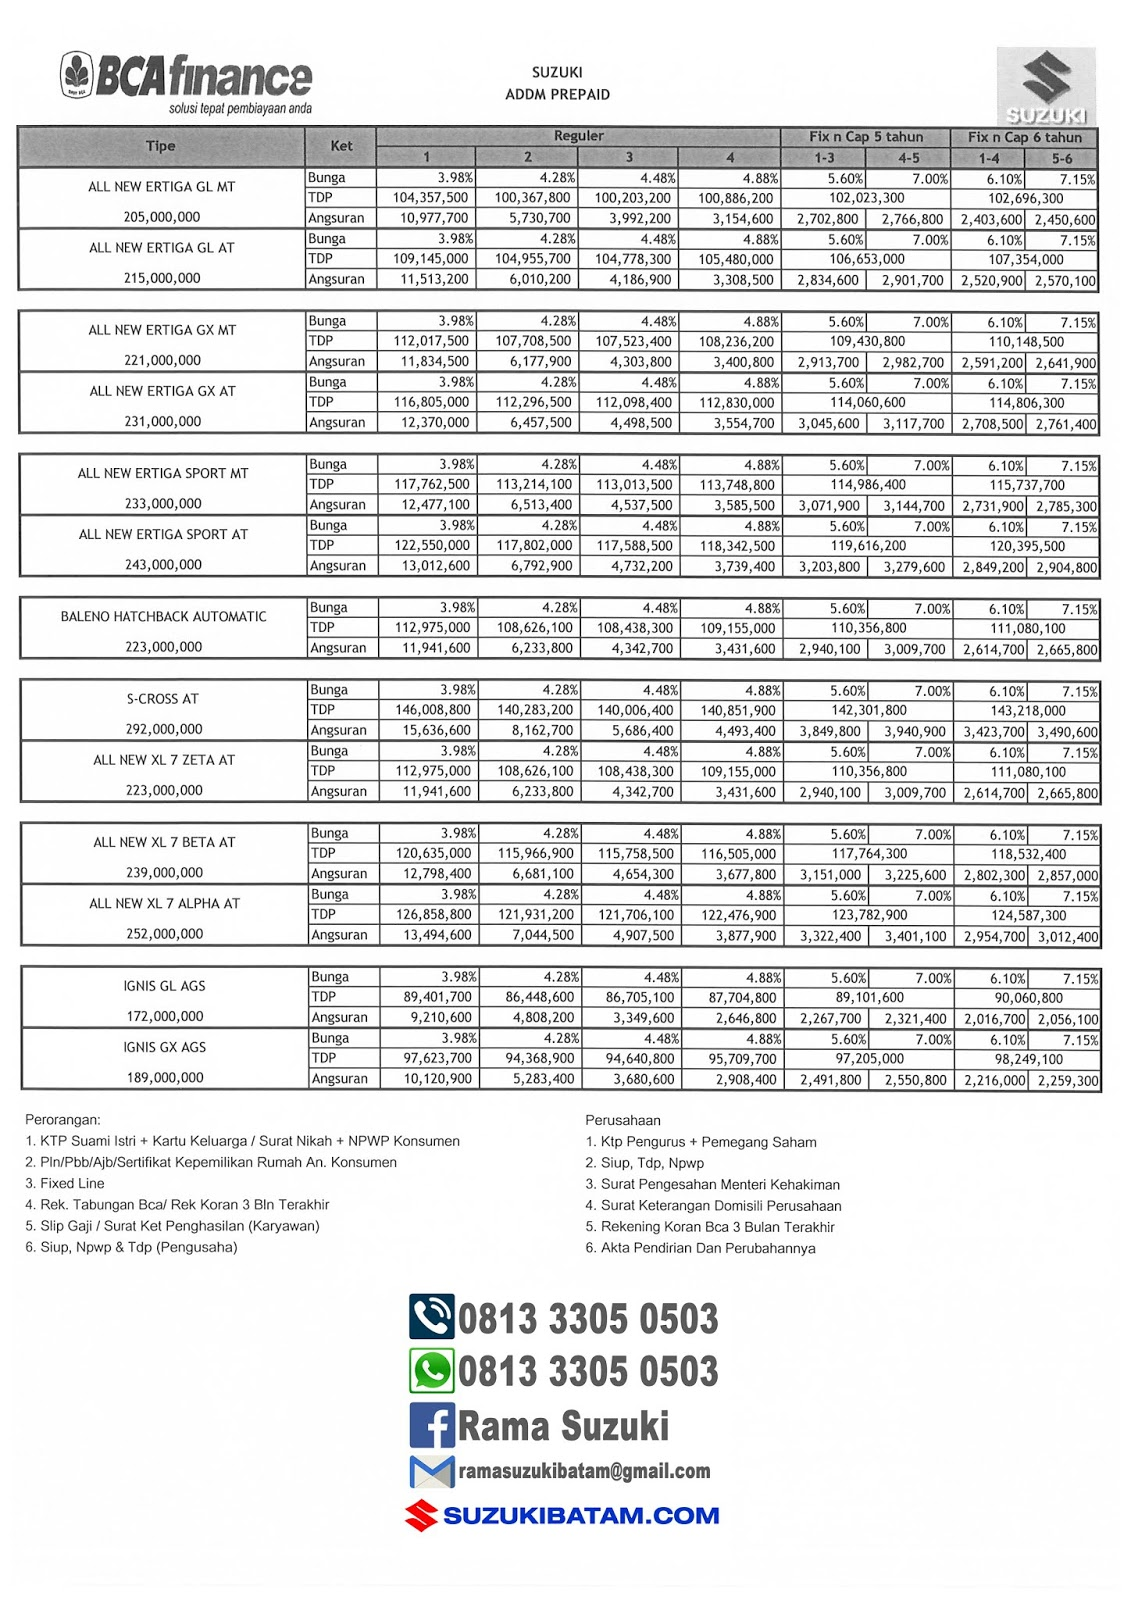 Harga Kredit Mobil Suzuki Batam Mei 2020 Bca Finance Dealer Resmi Mobil Suzuki Batam